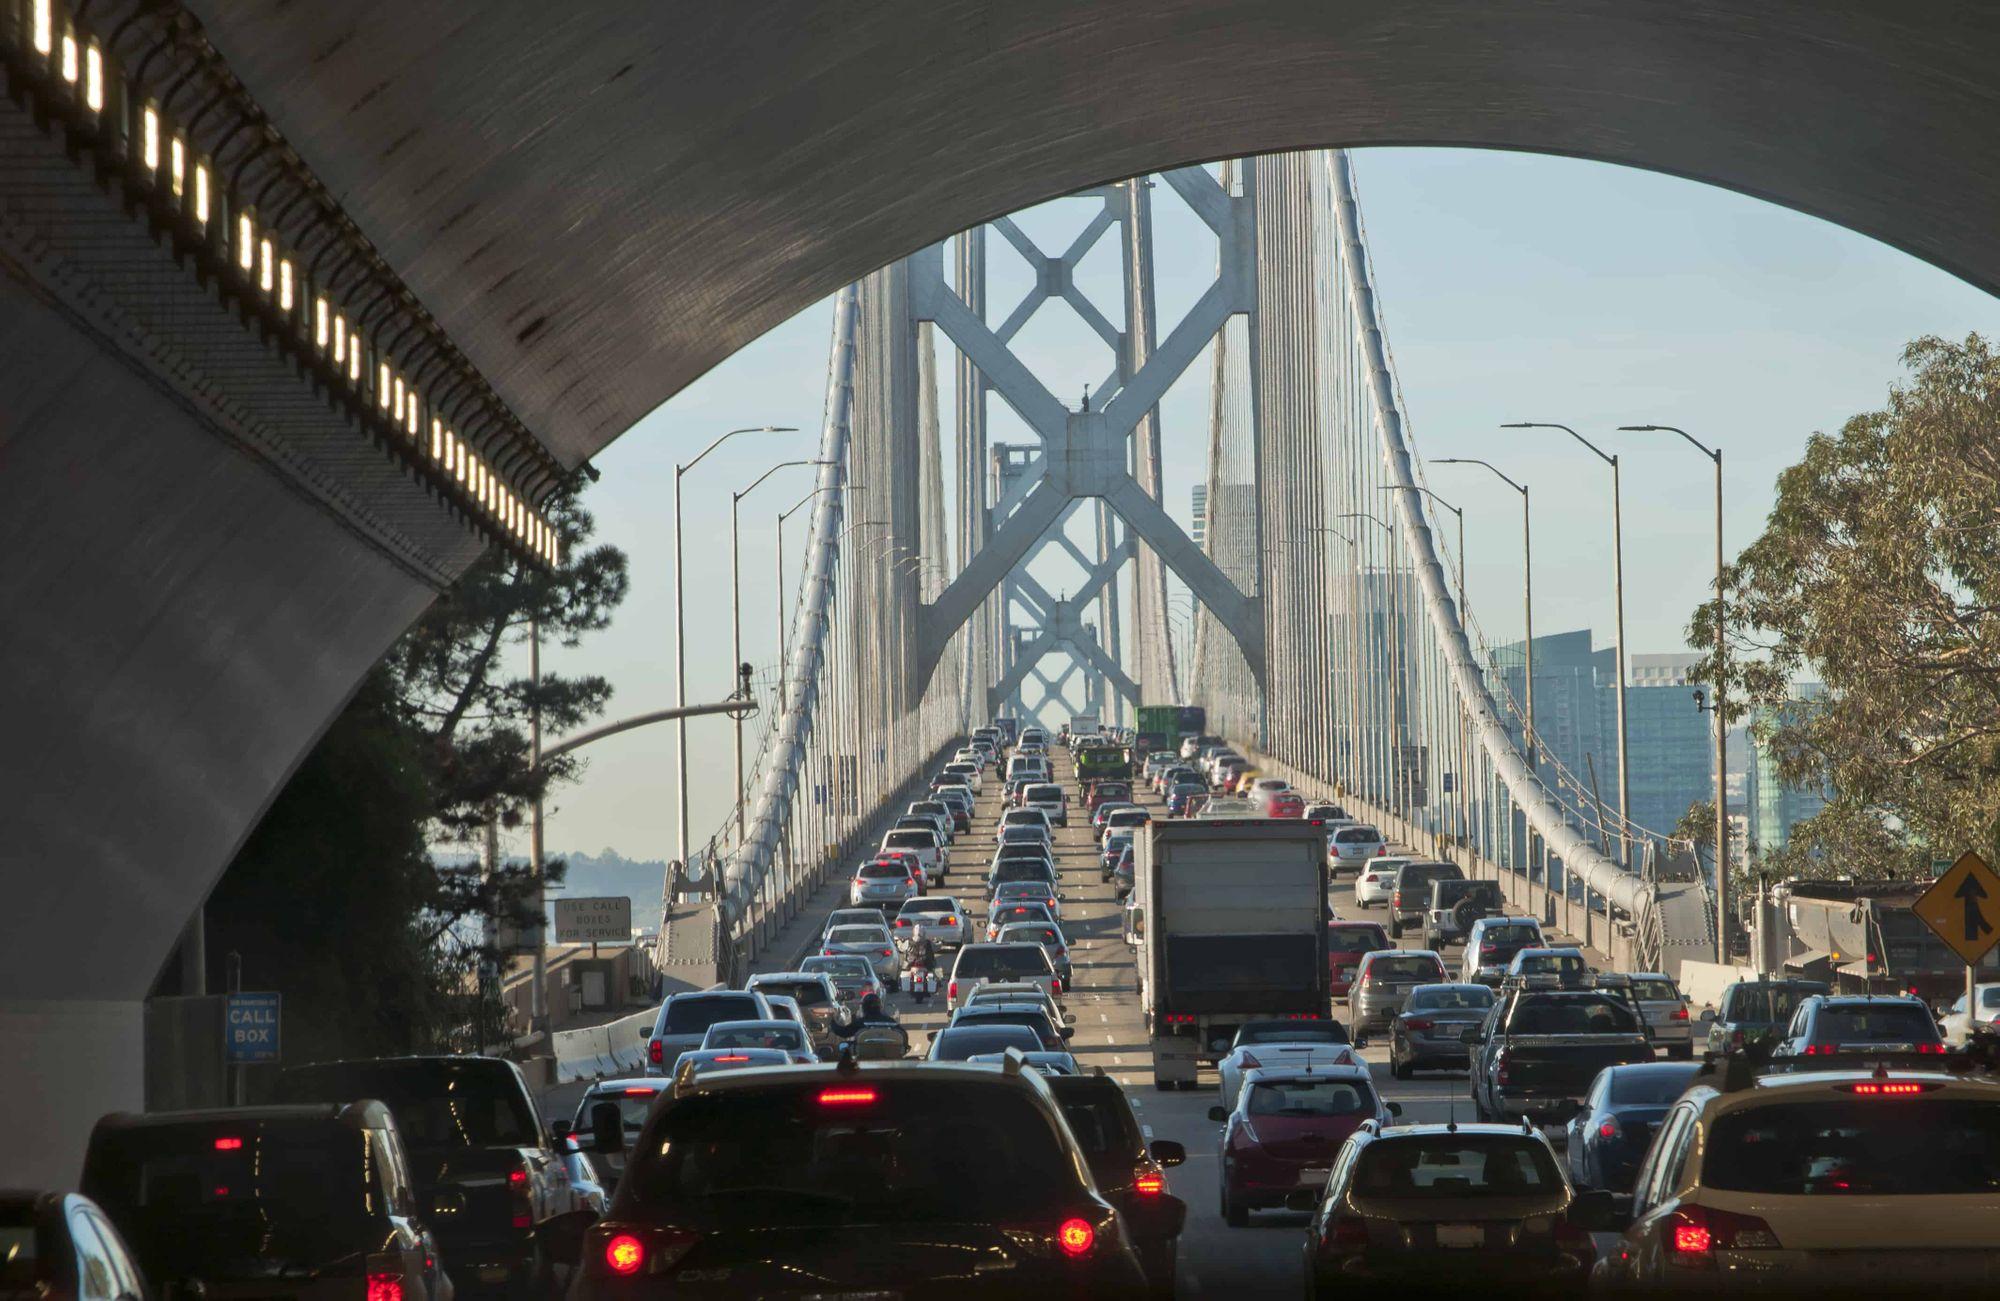 Transito ponte engarrafamento de carros